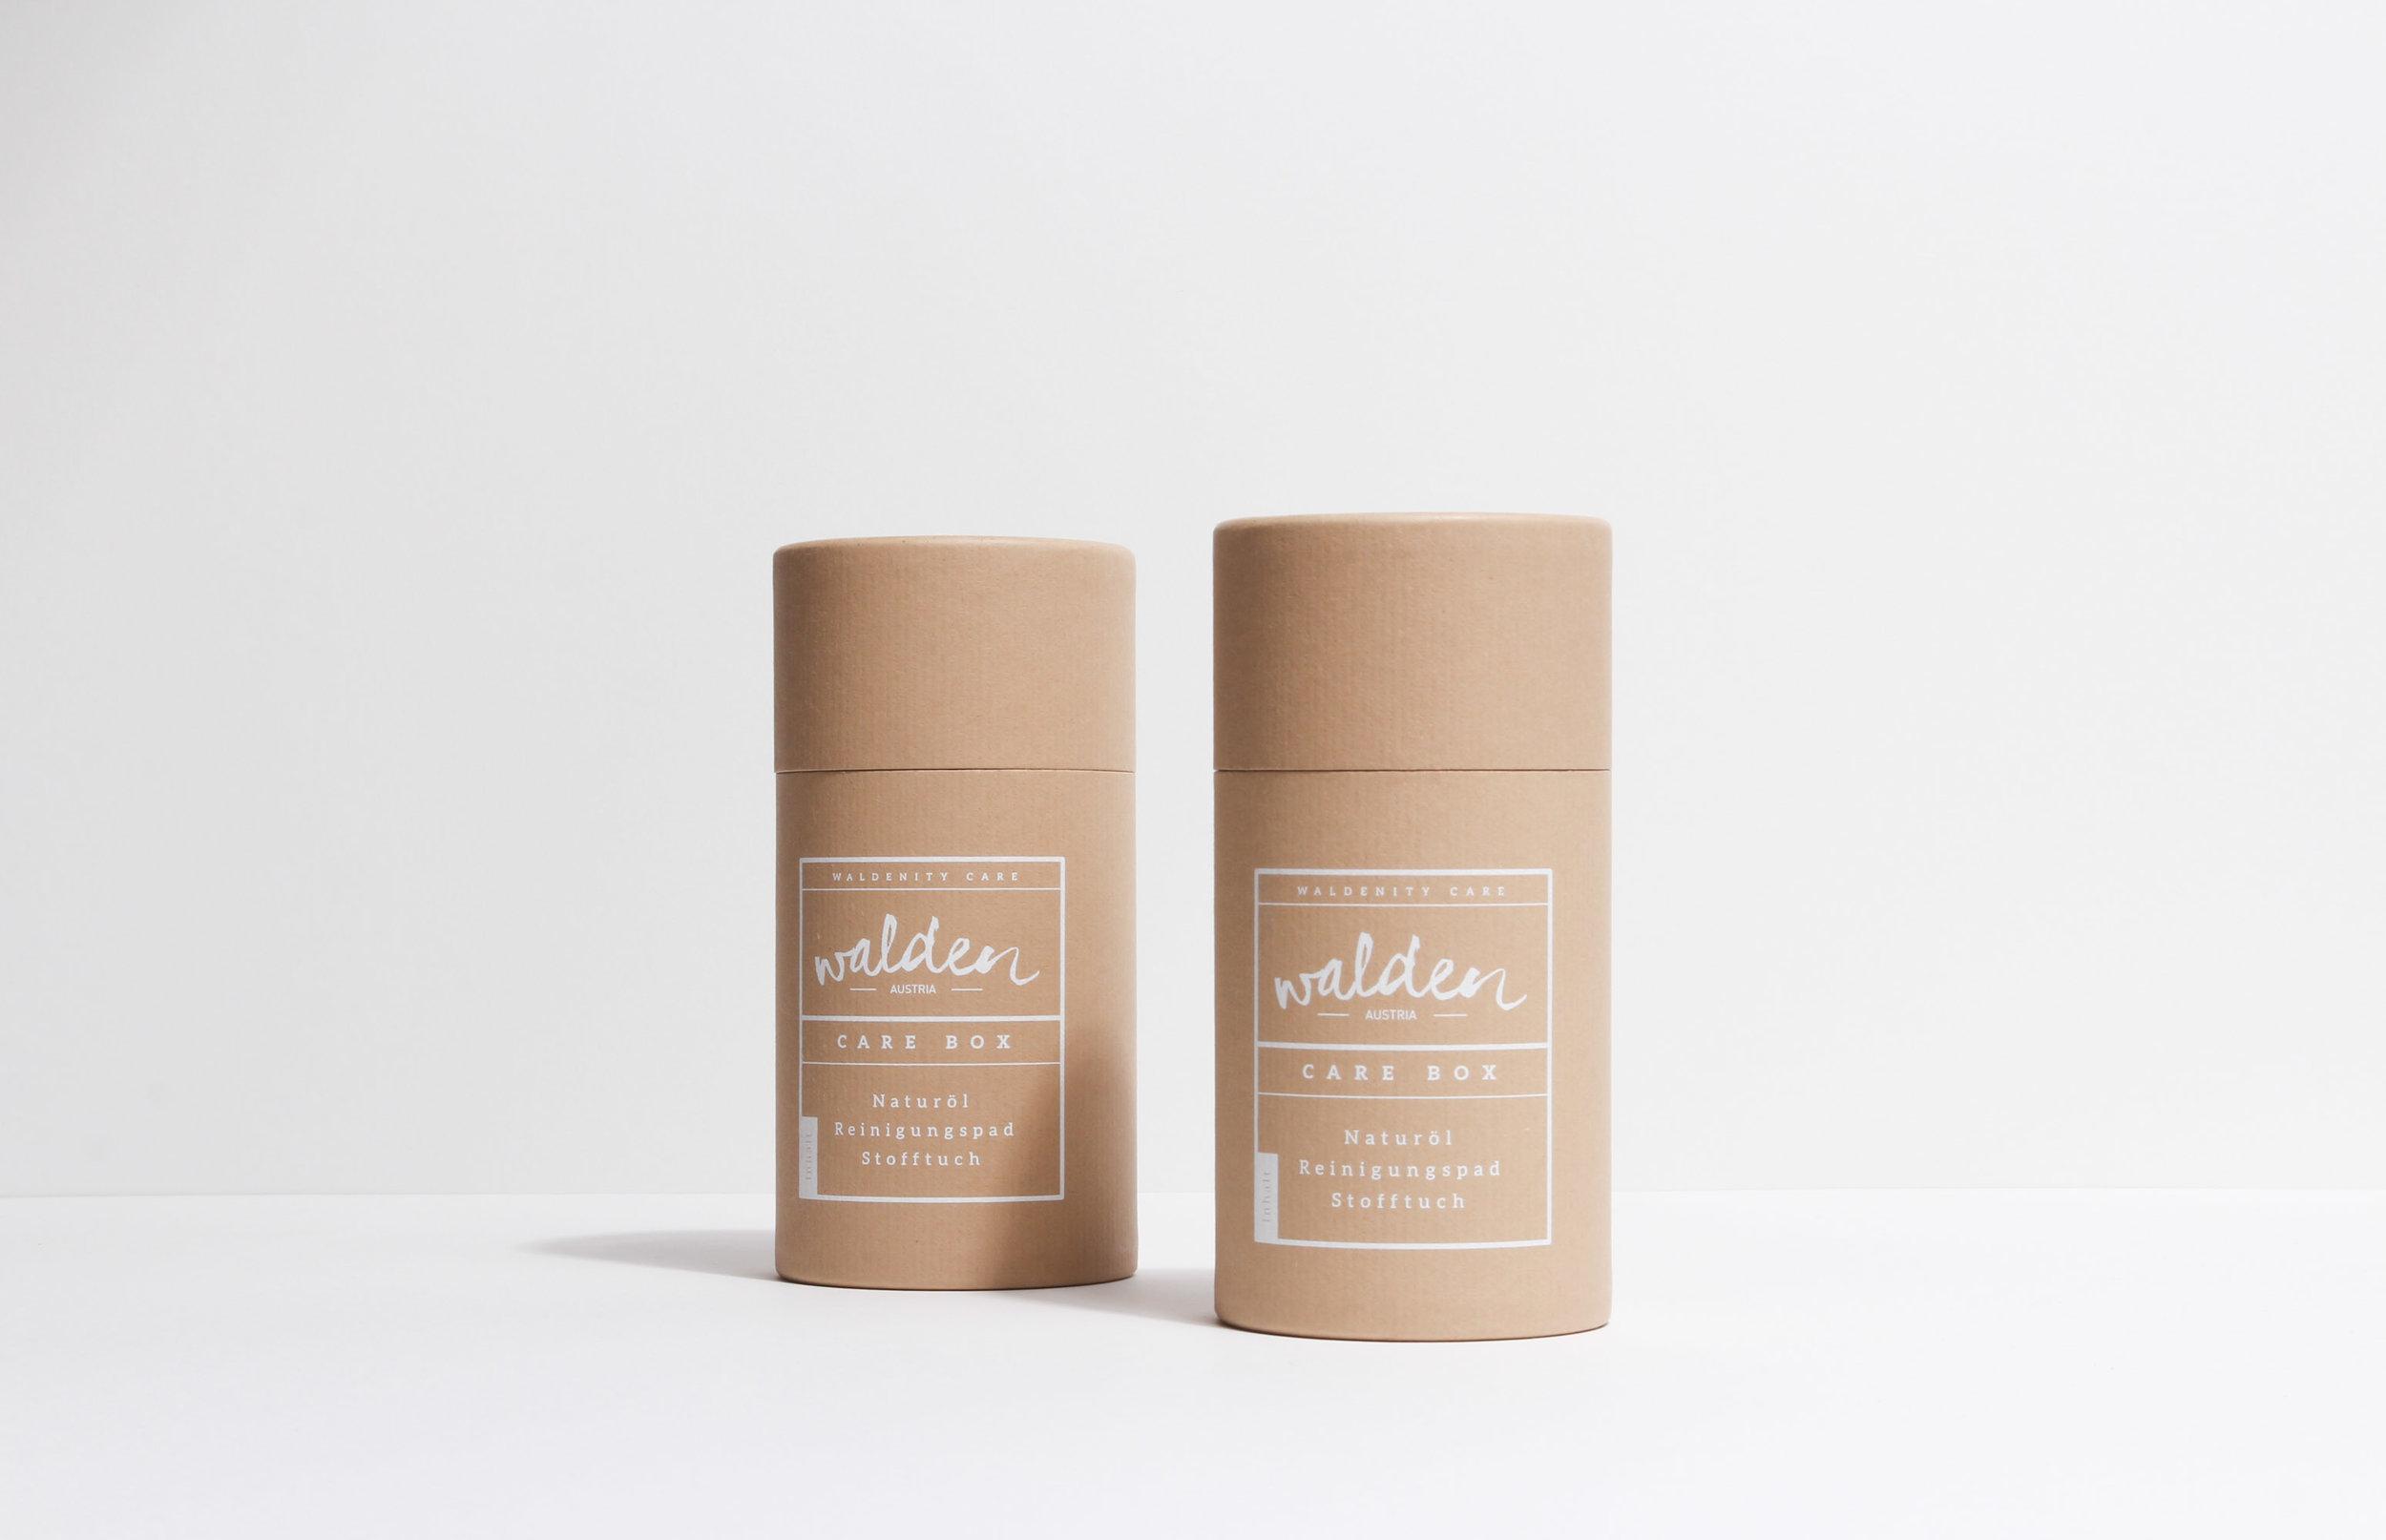 walden - CareBox